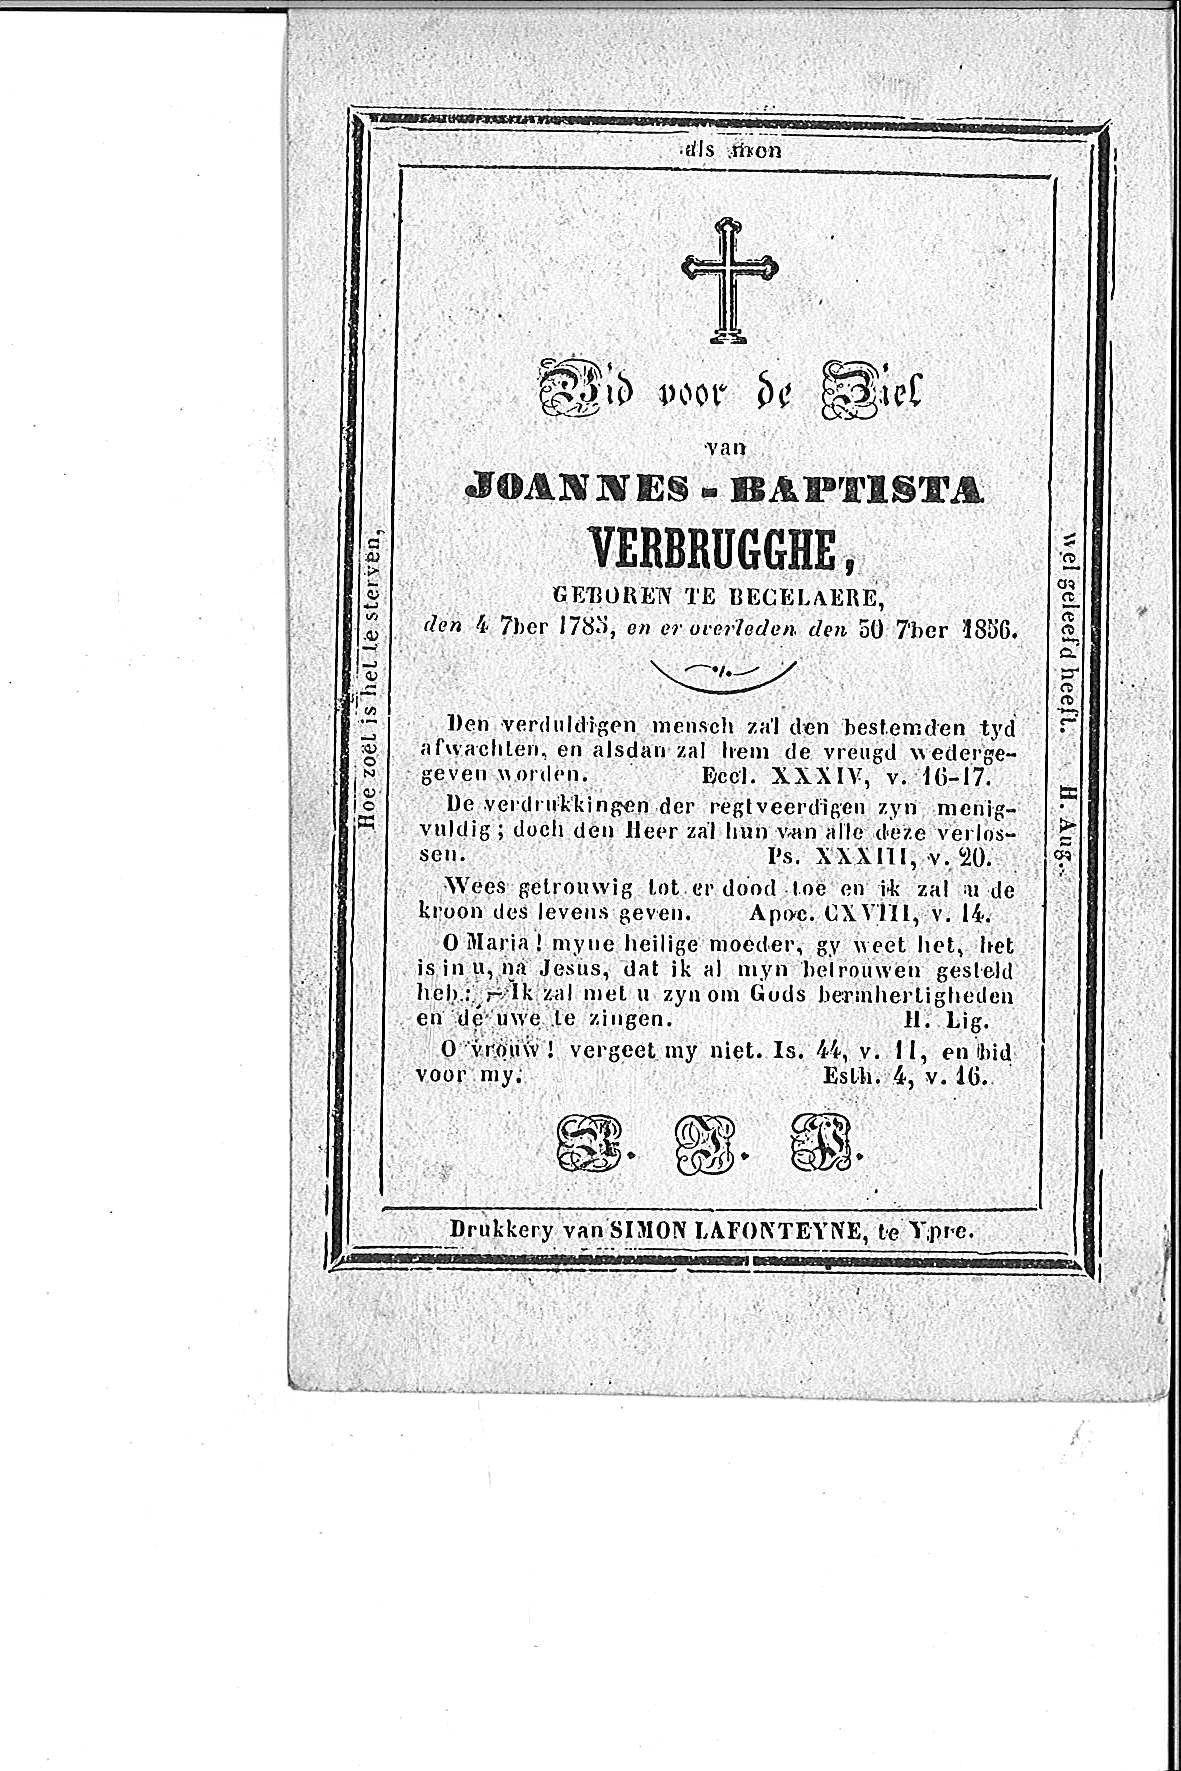 Joannes_Baptista(1856)20150731114447_00013.jpg